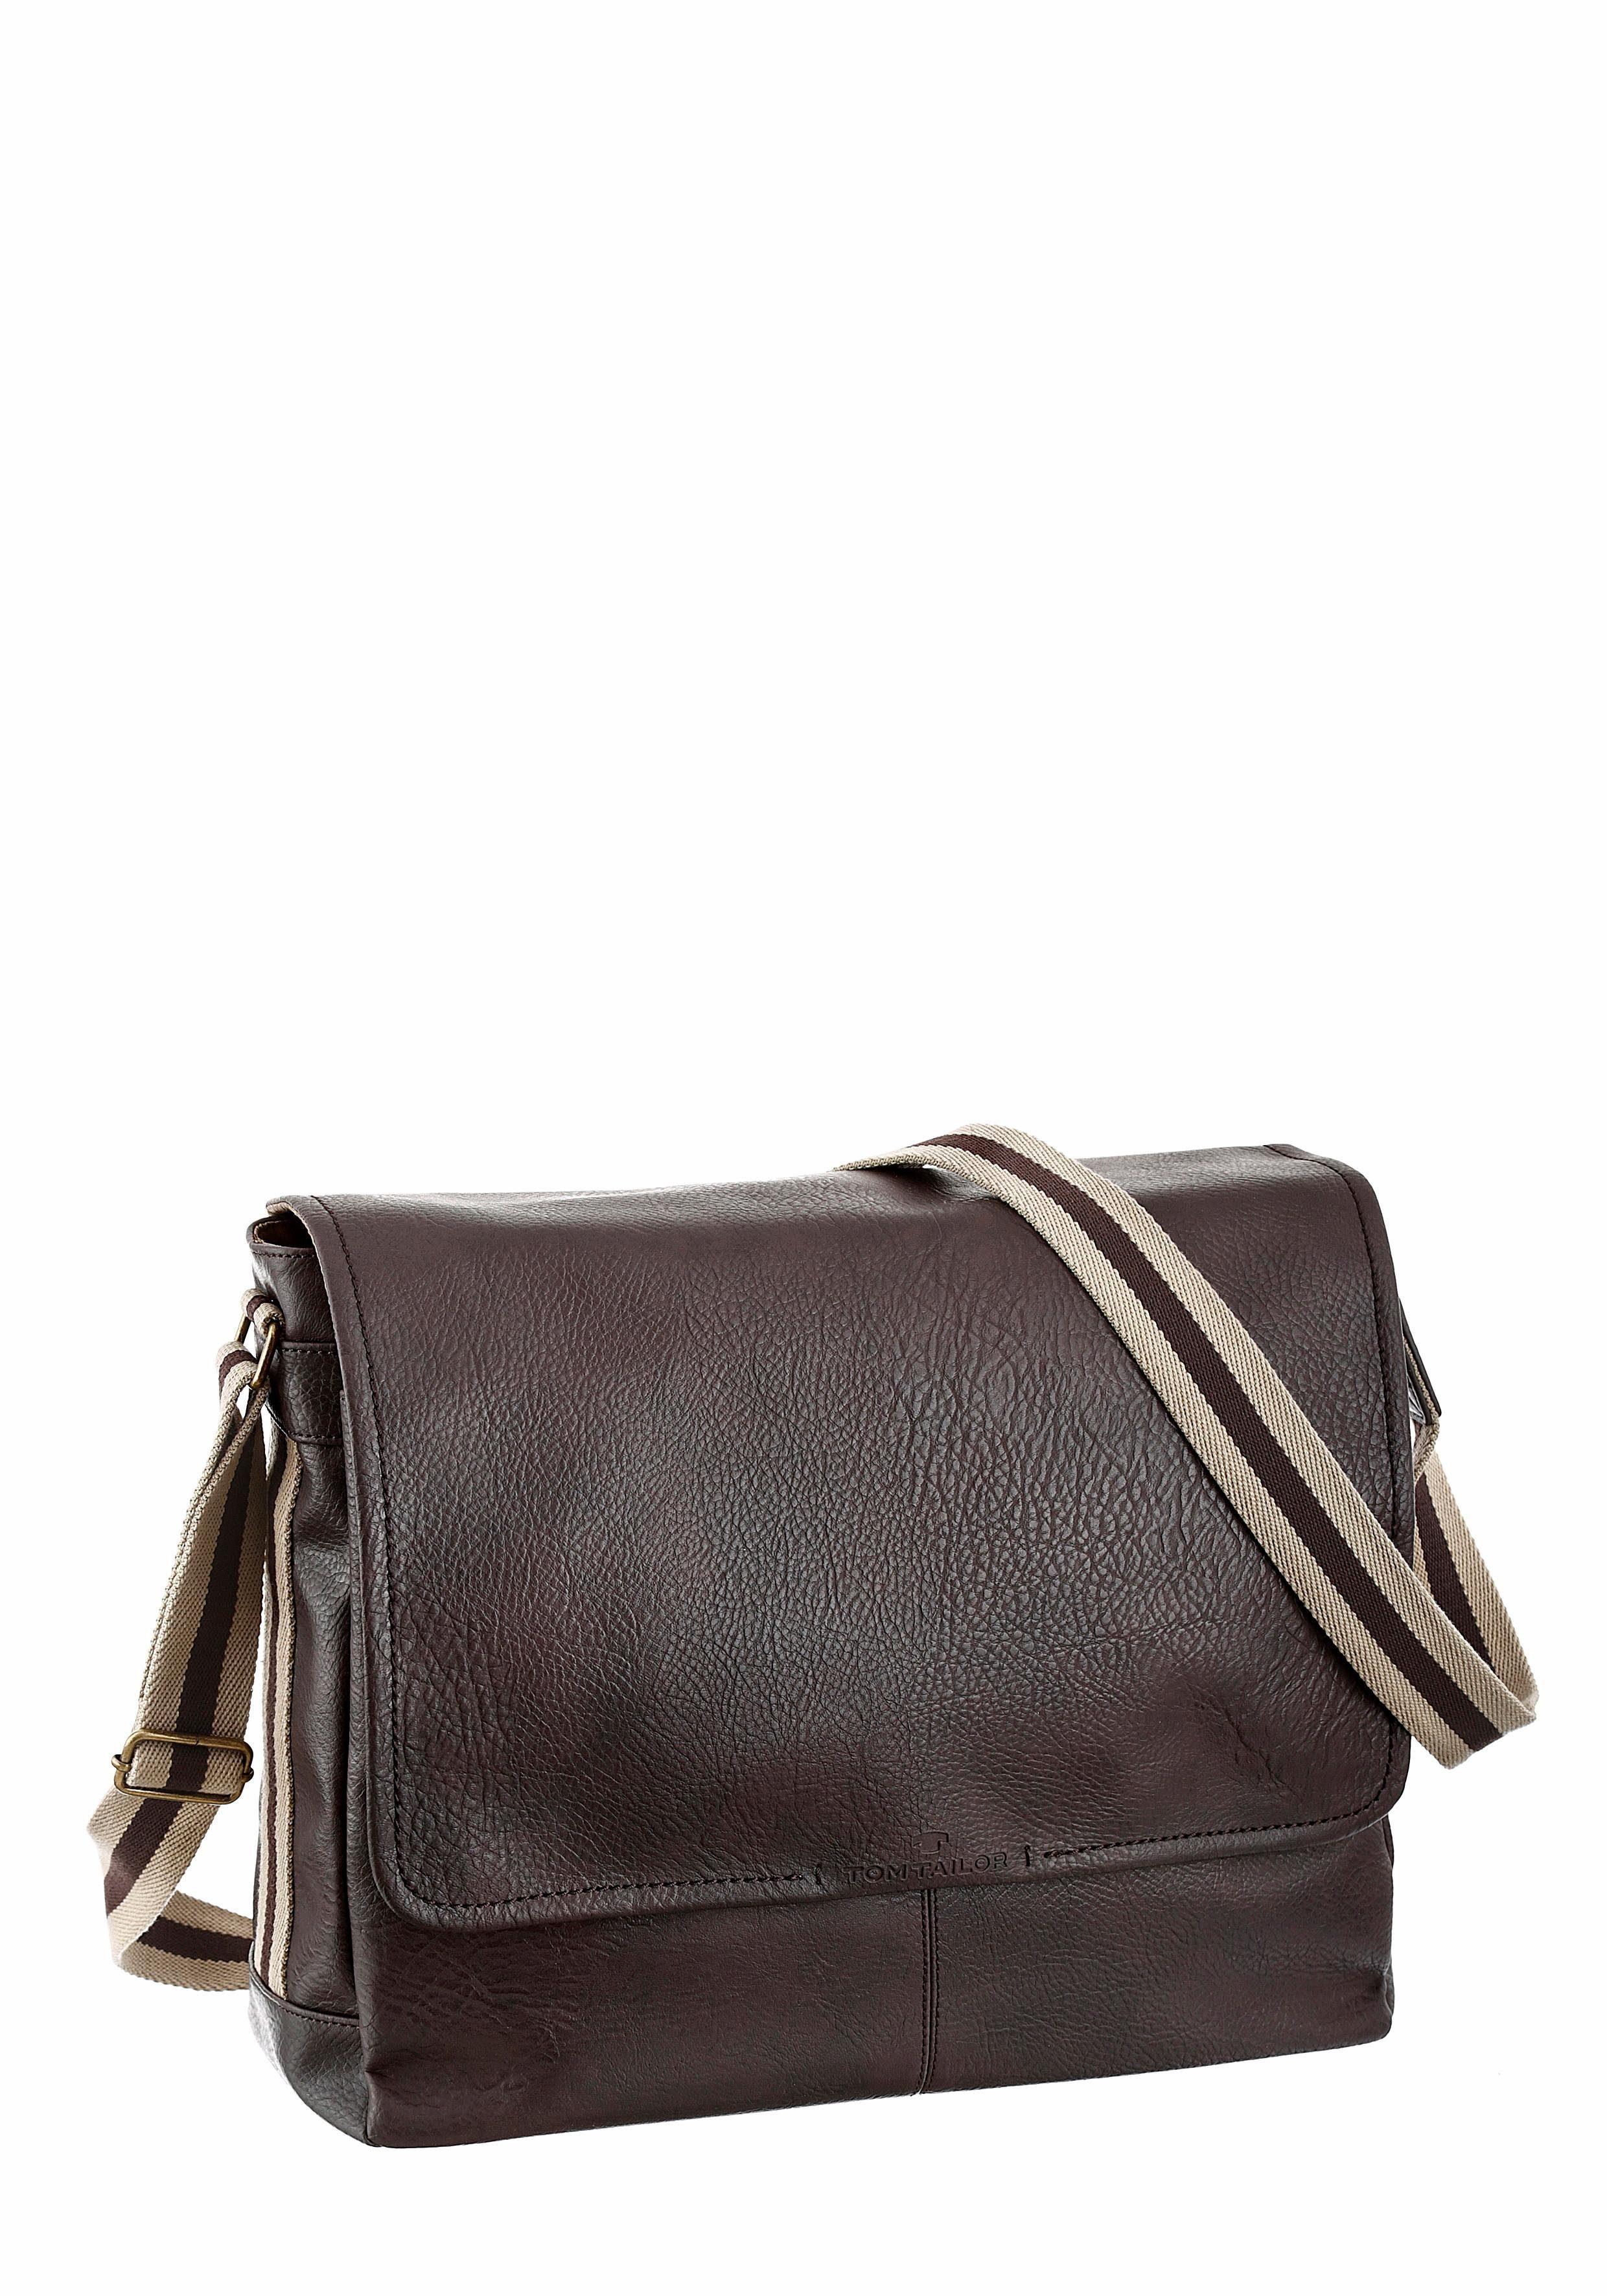 Tom Tailor Umhängetasche »Kentucky«, Crossbody Bag mit verstellbarem Schultergurt